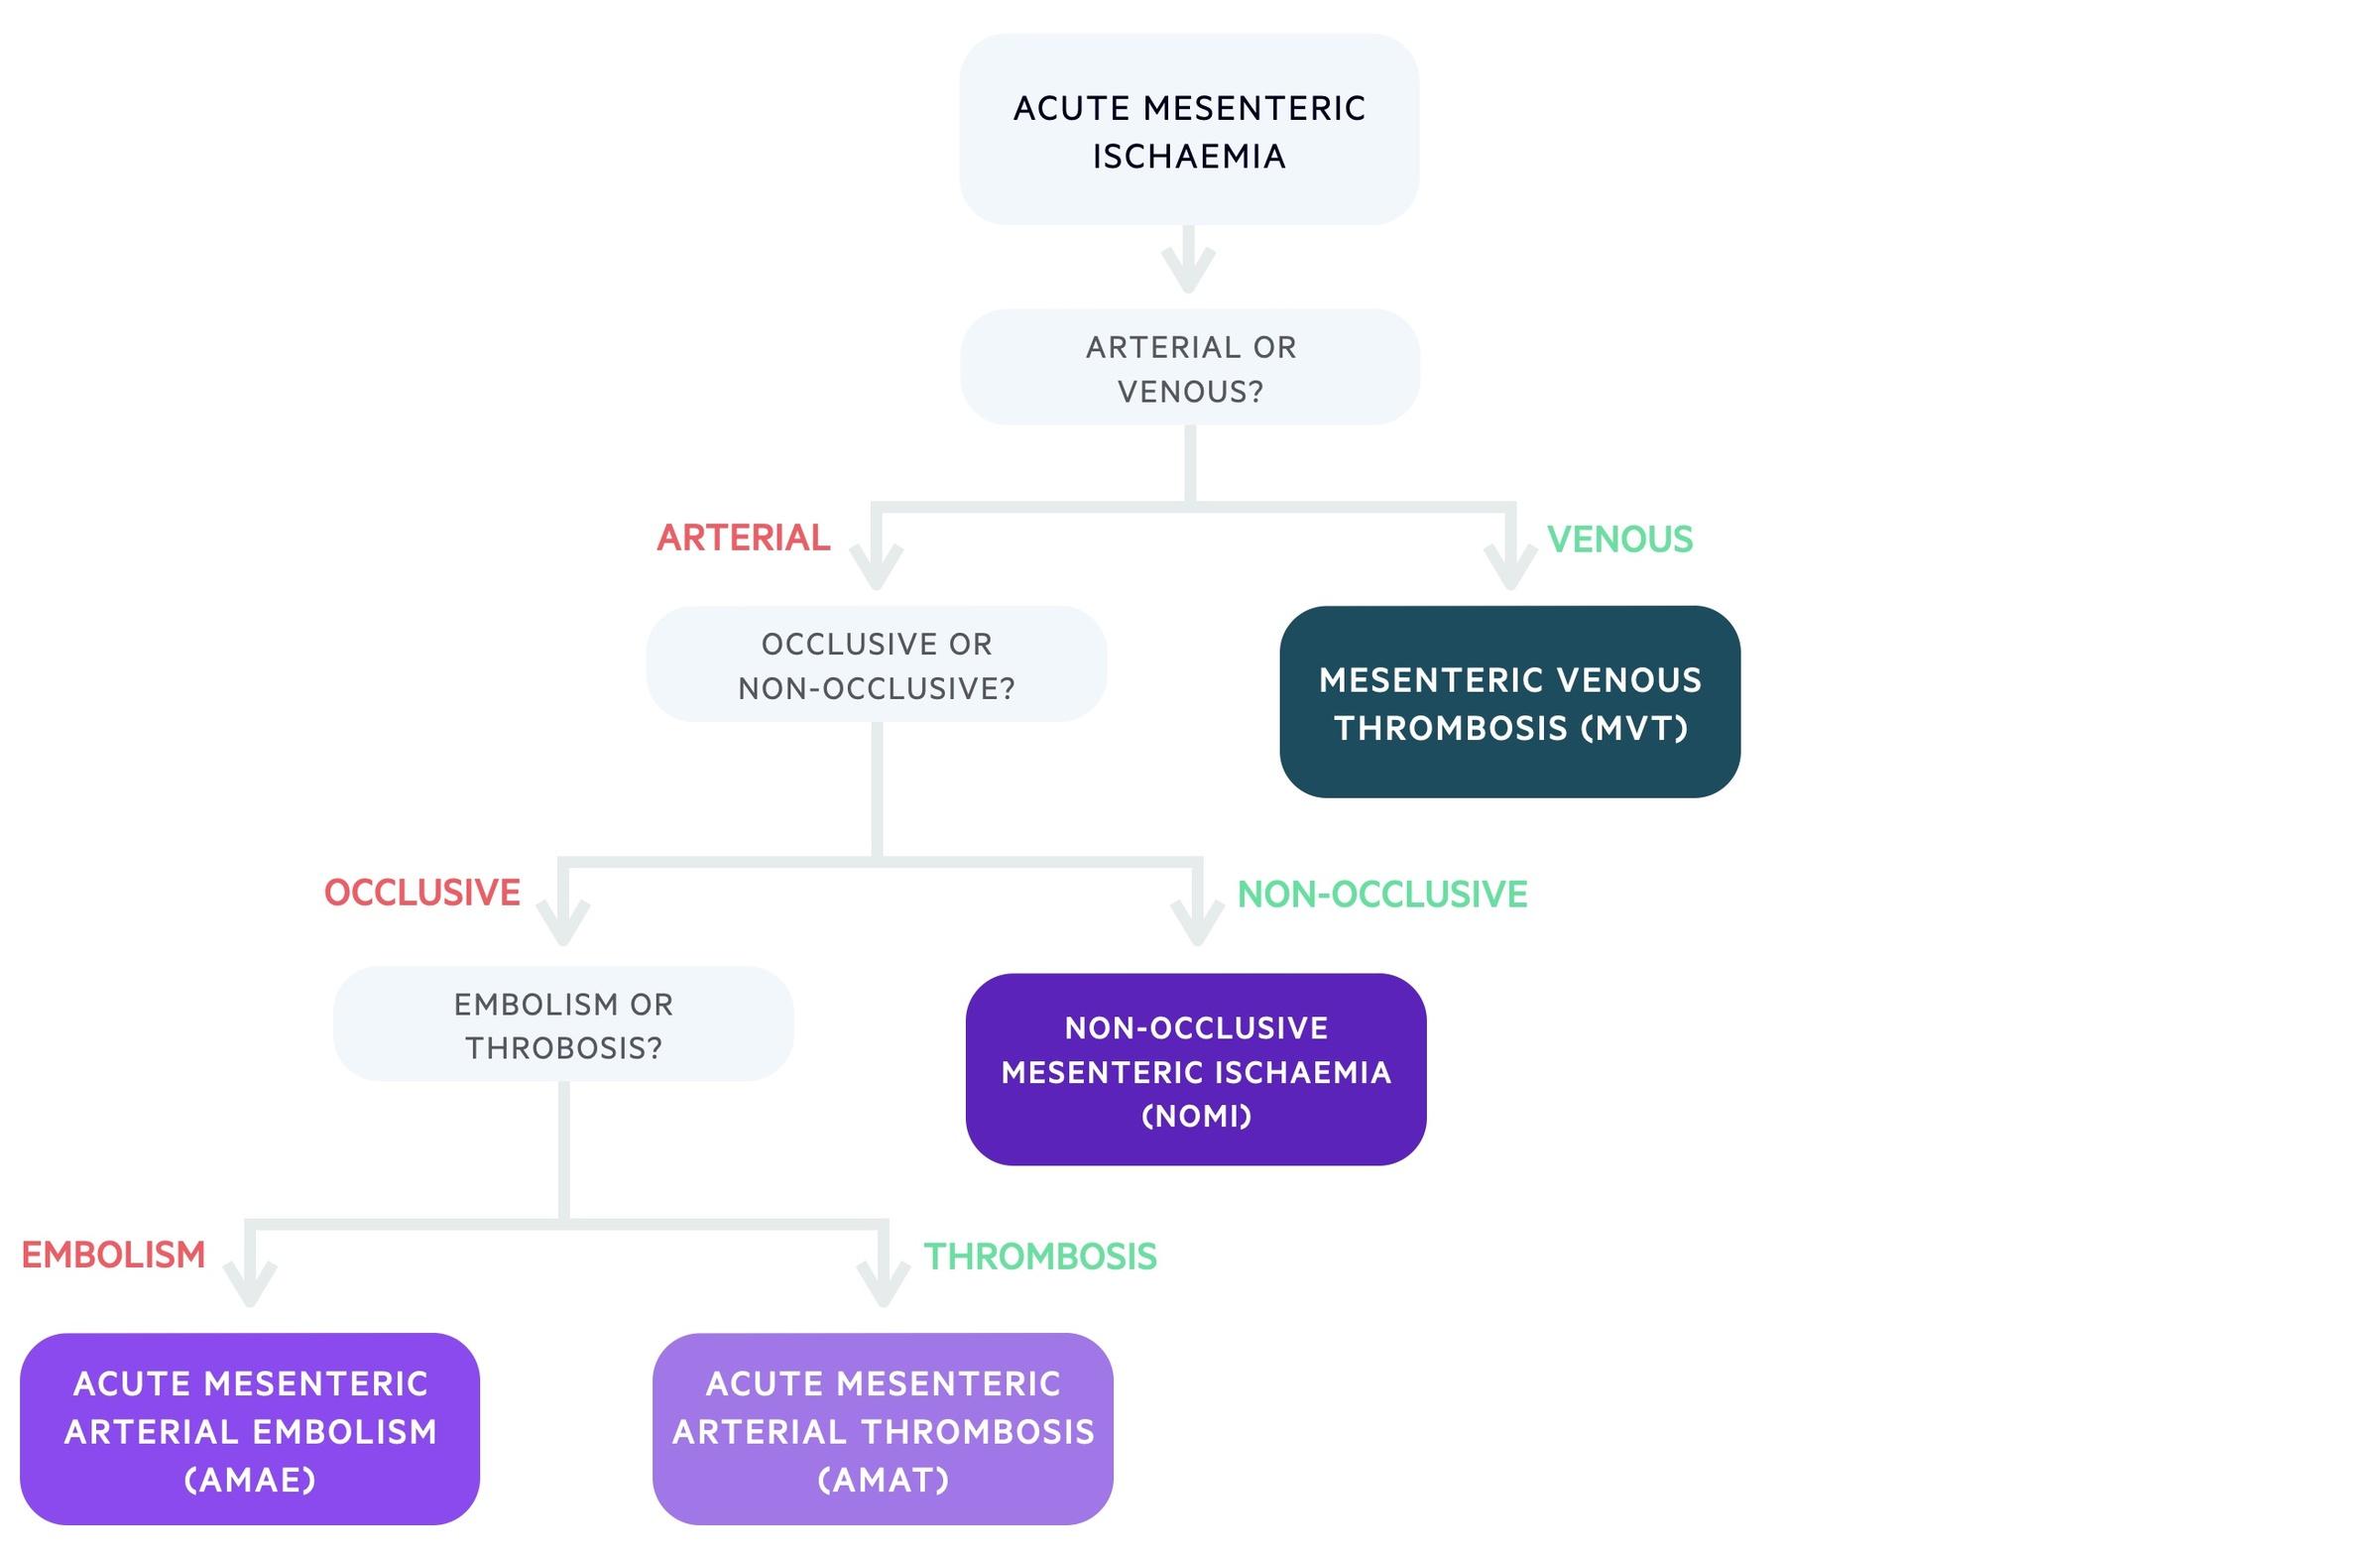 Subtypes of acute mesenteric ischaemia